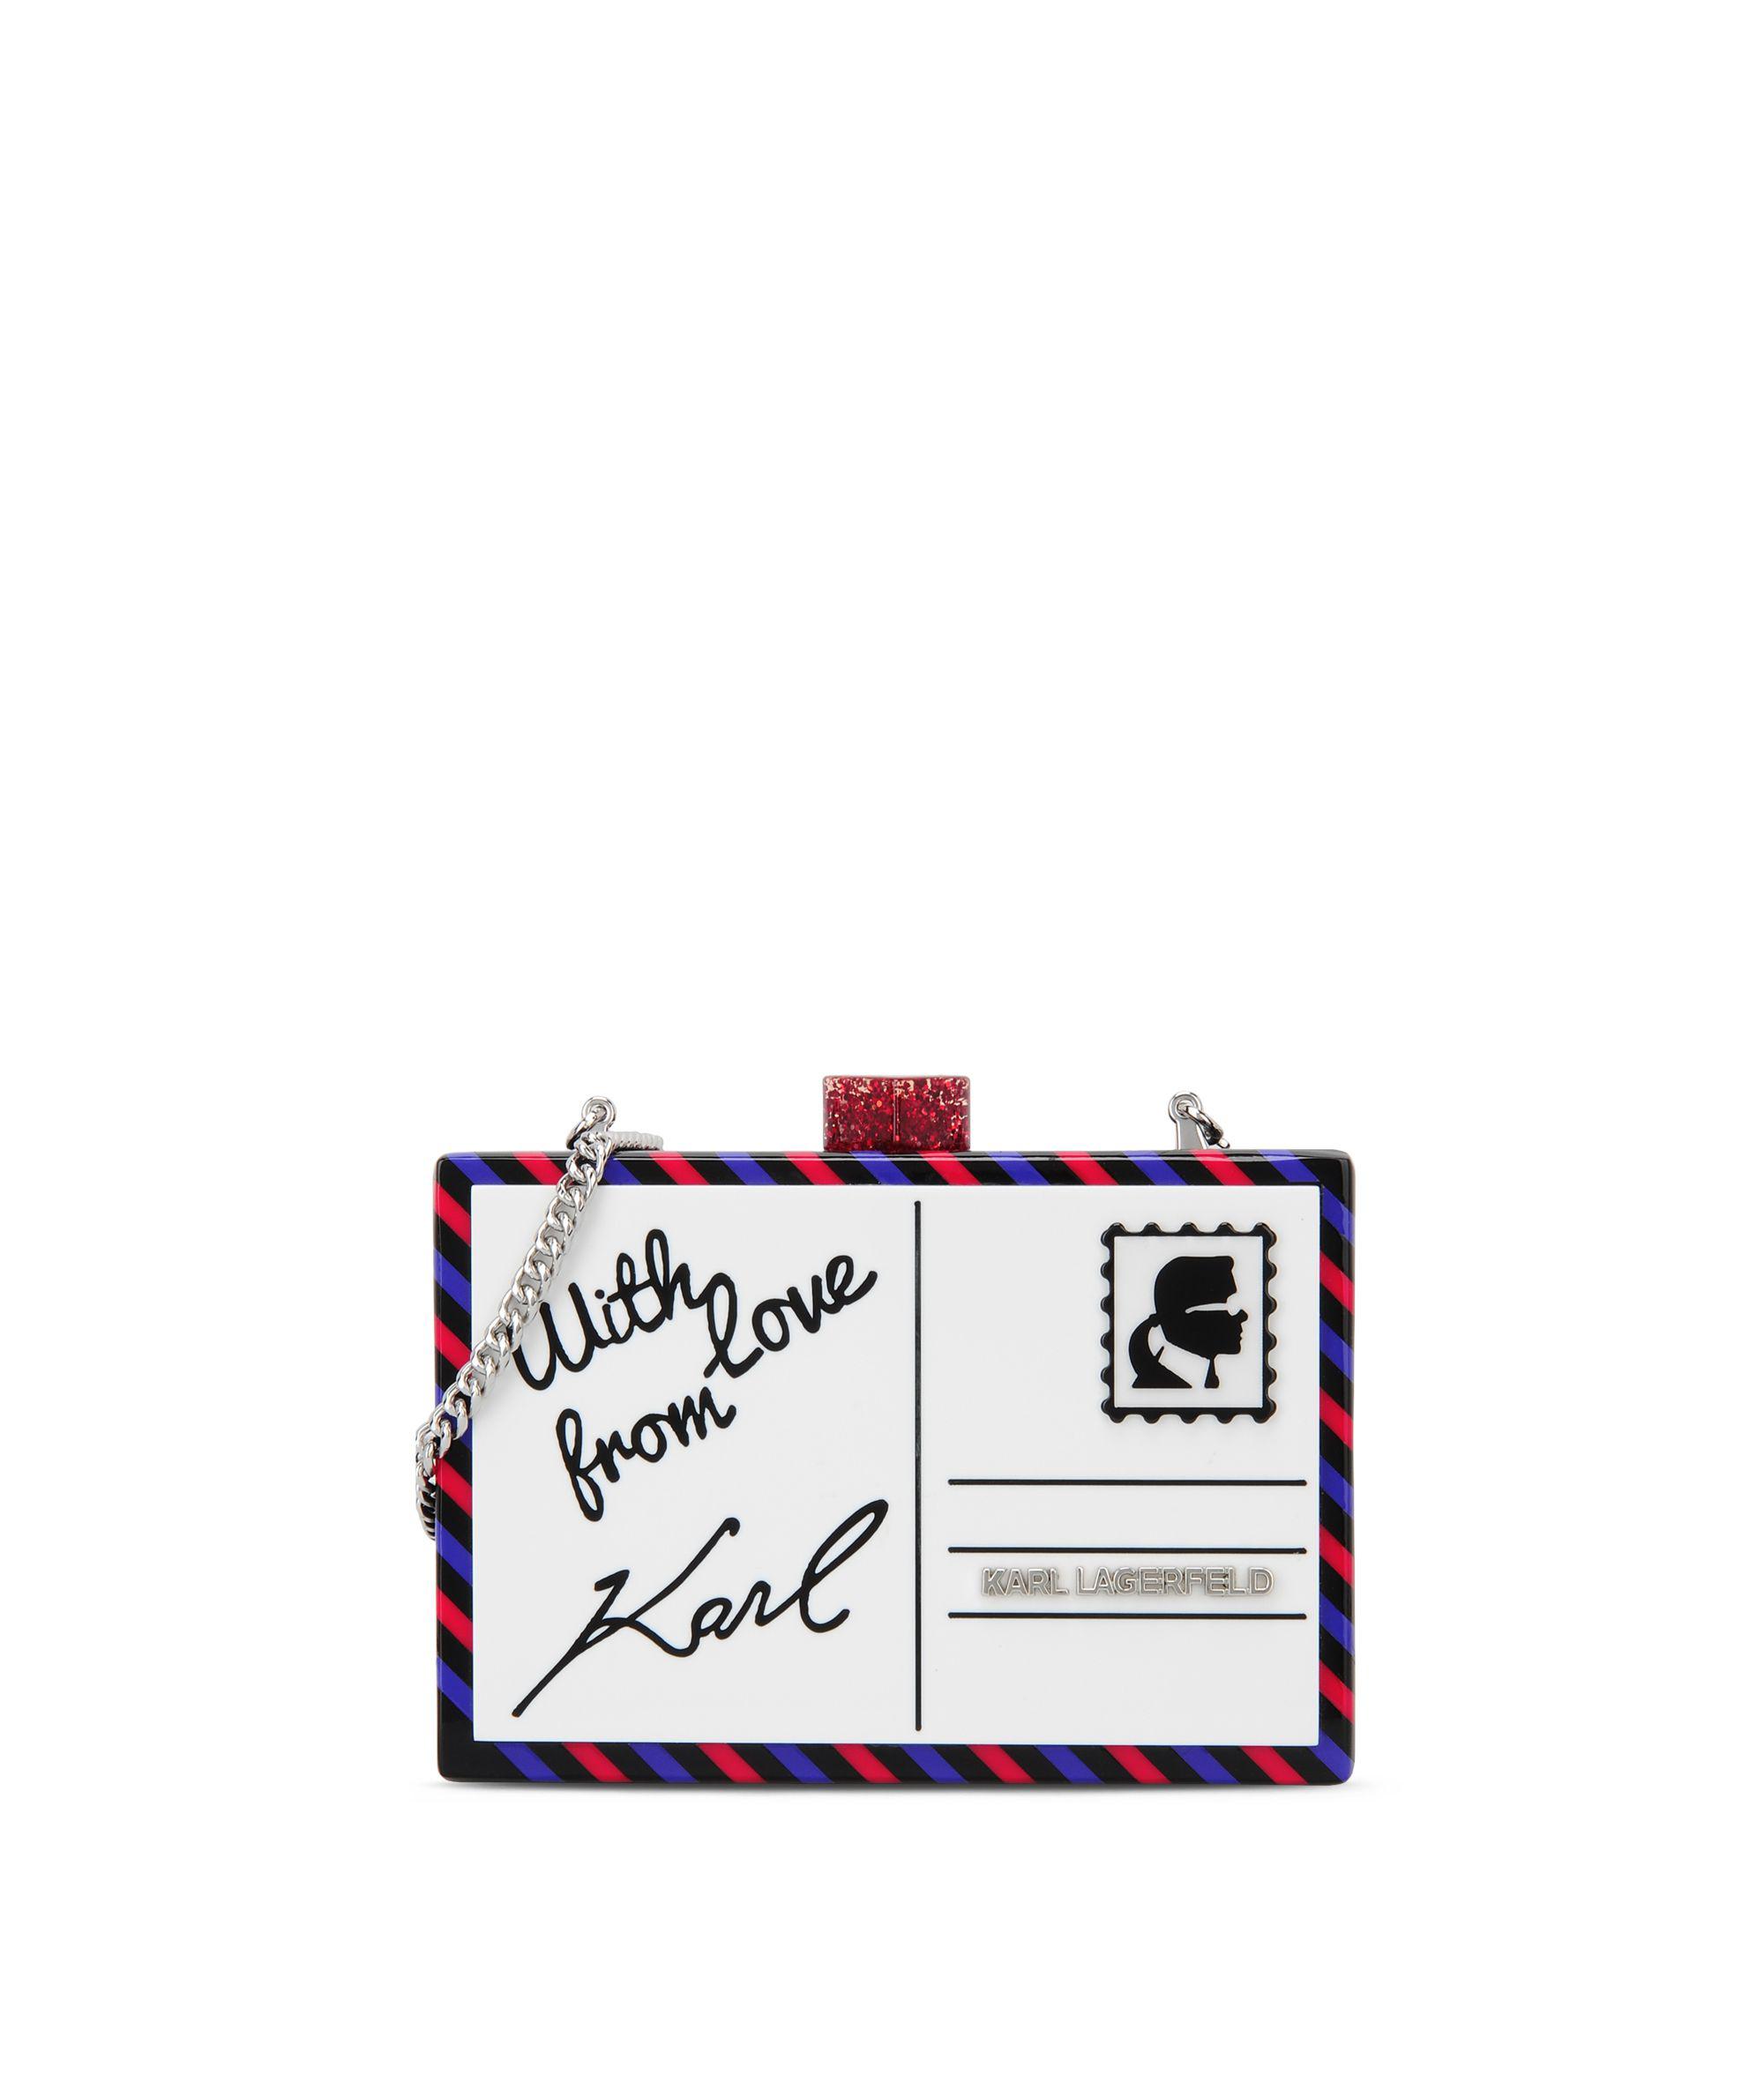 Postcard Minaudiere 66KW3076 Karl Lagerfeld accessories: Uvod u uzbudljivu XYZ modnu jesen